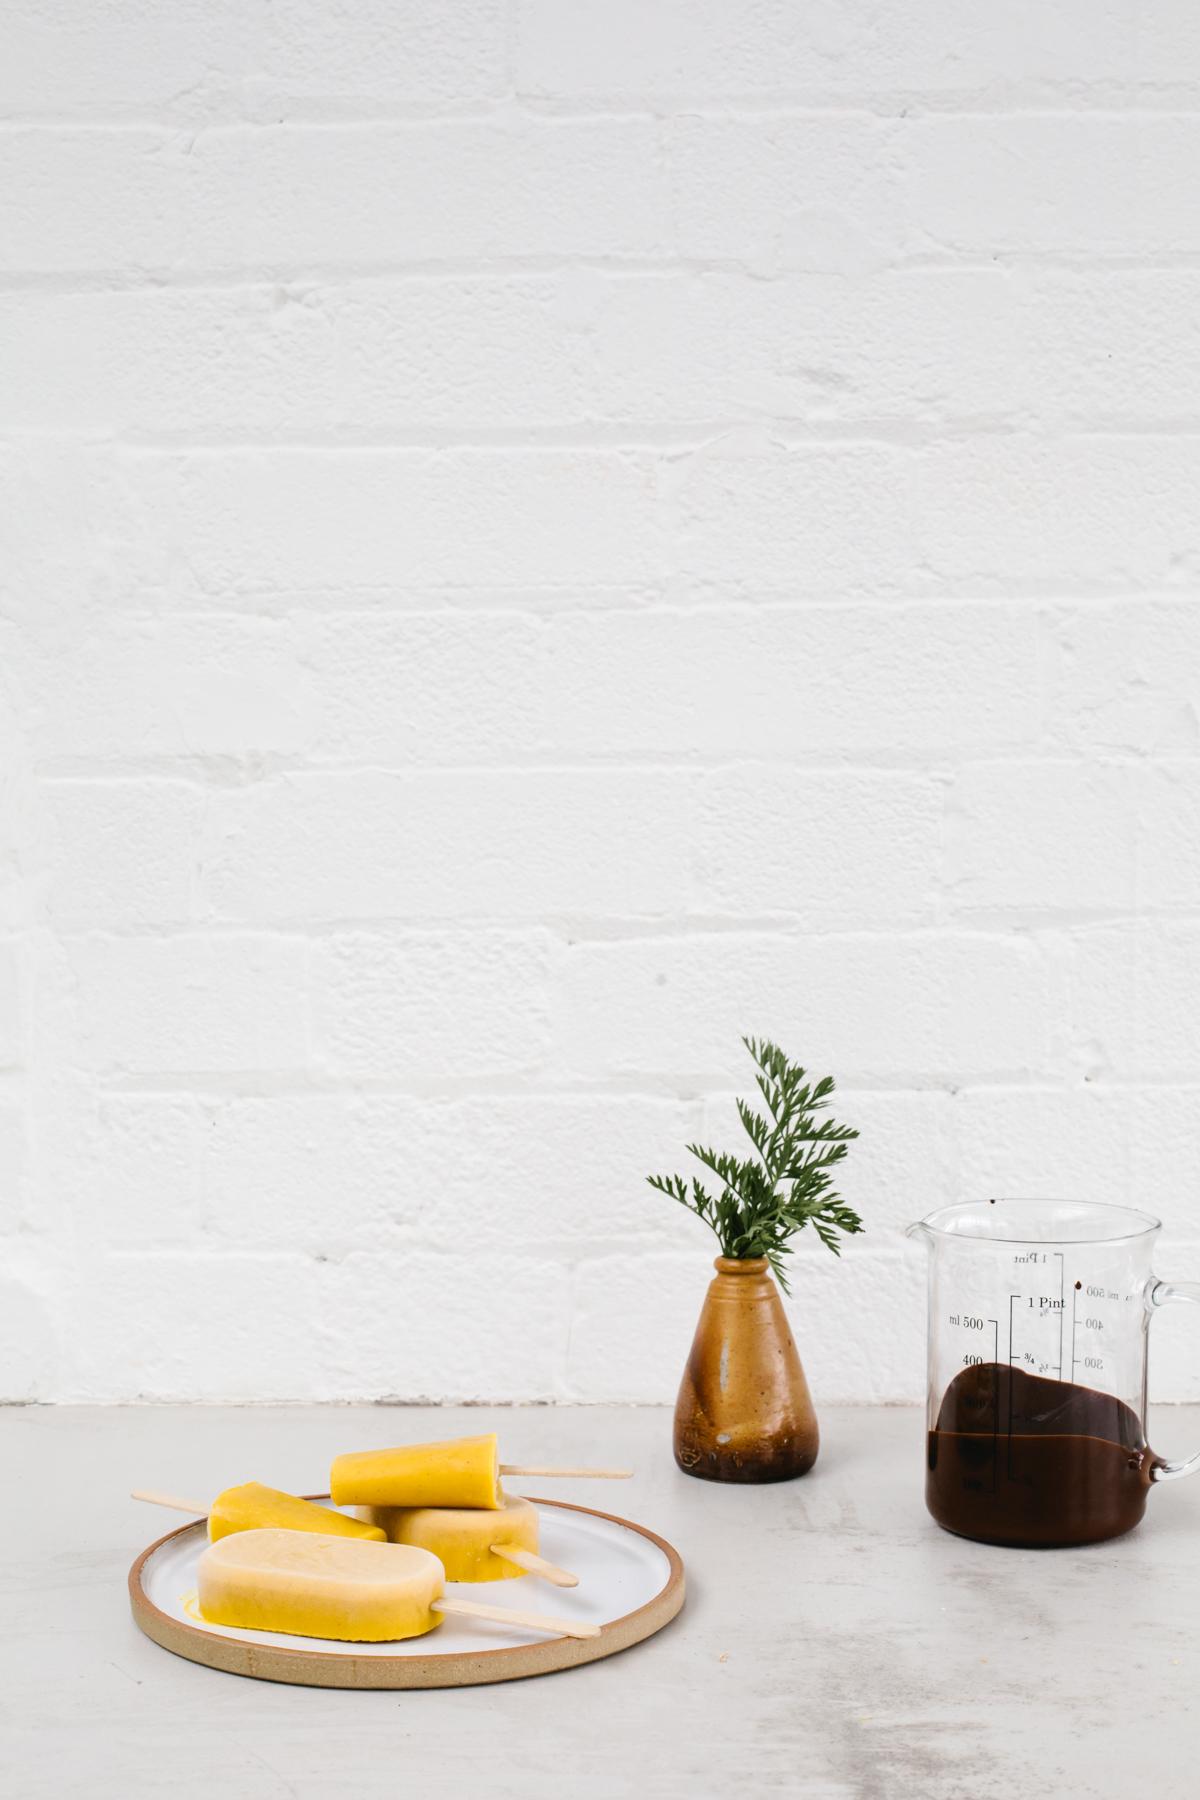 Carrot Halwa Popsicles by Erika Raxworthy / Rye London